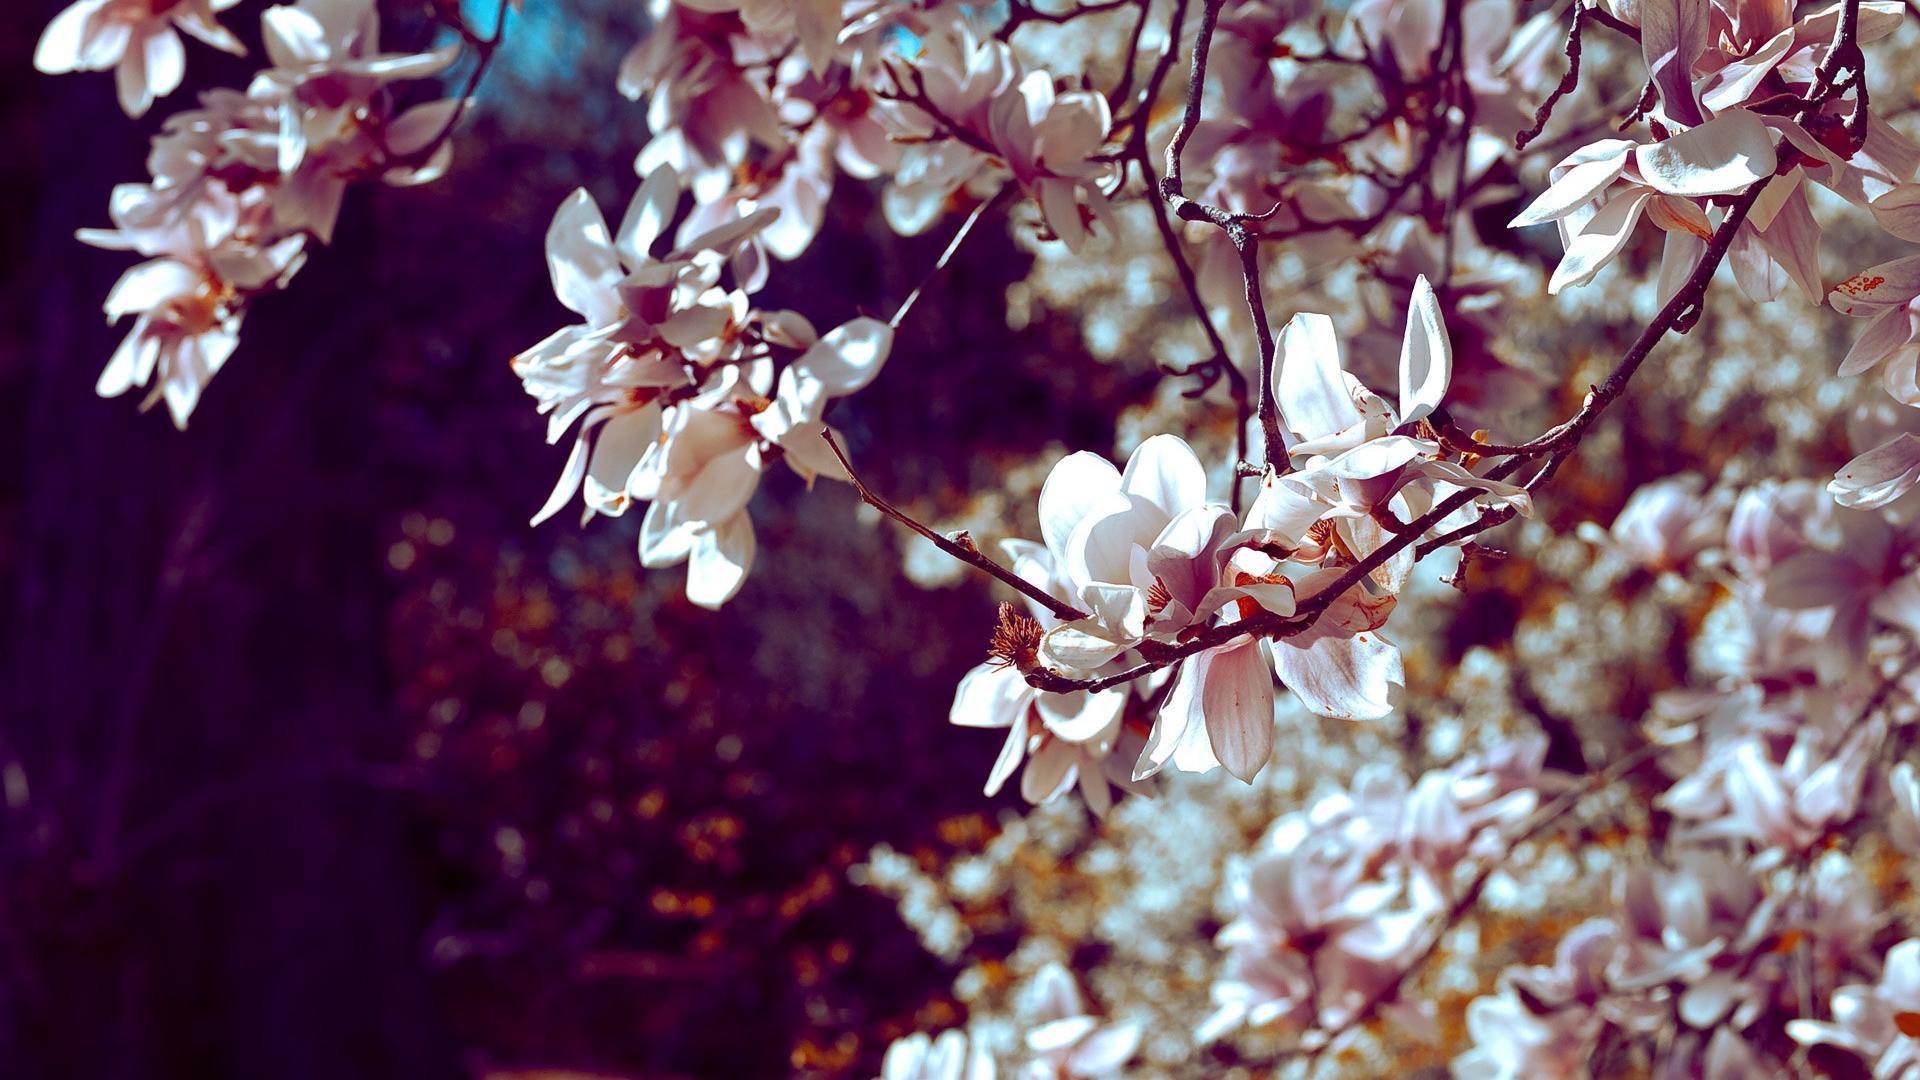 1000 Wallpapers Cute Cherry Blossom Backgrounds Pixelstalk Net